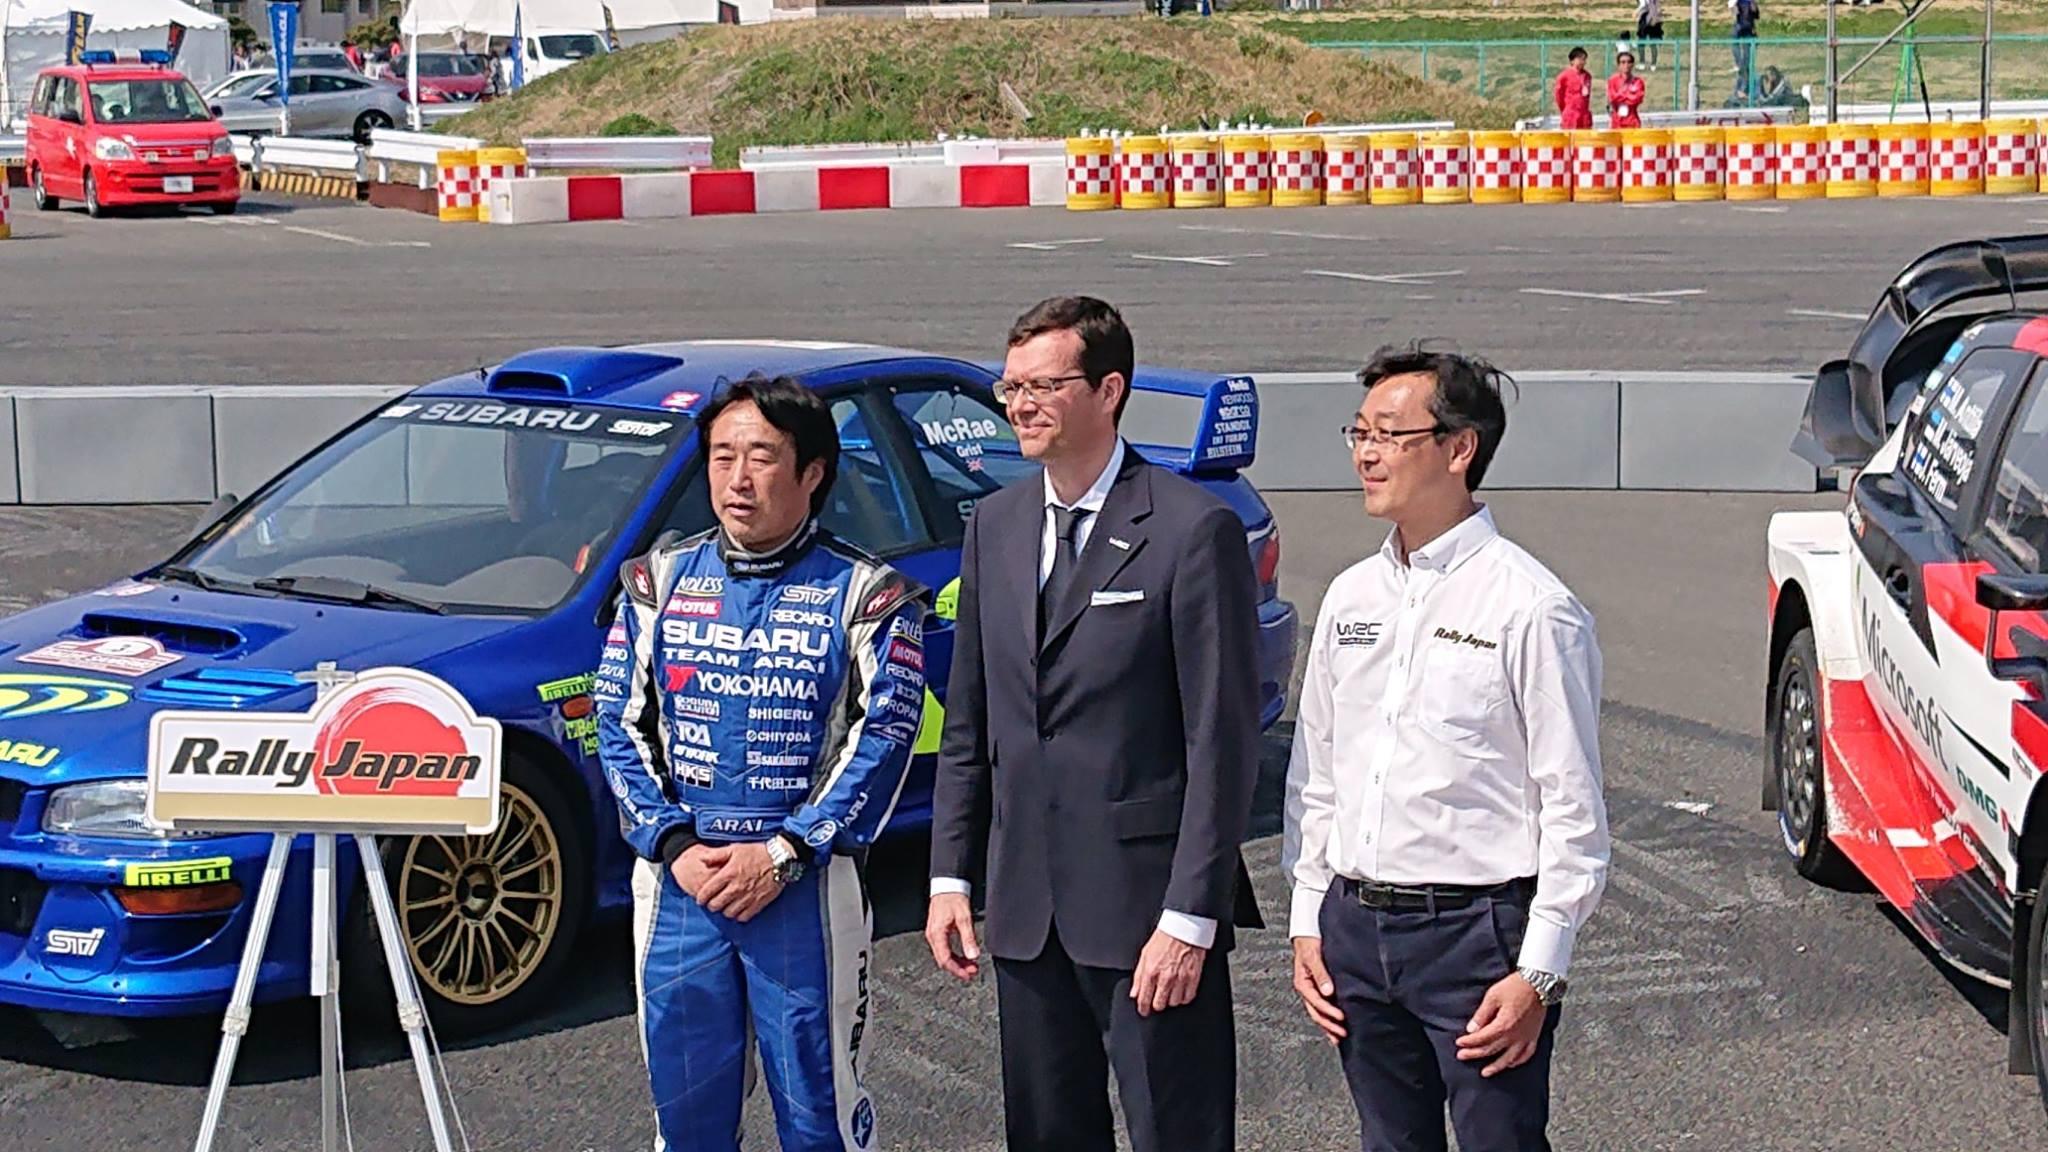 Rally Japan, WRC